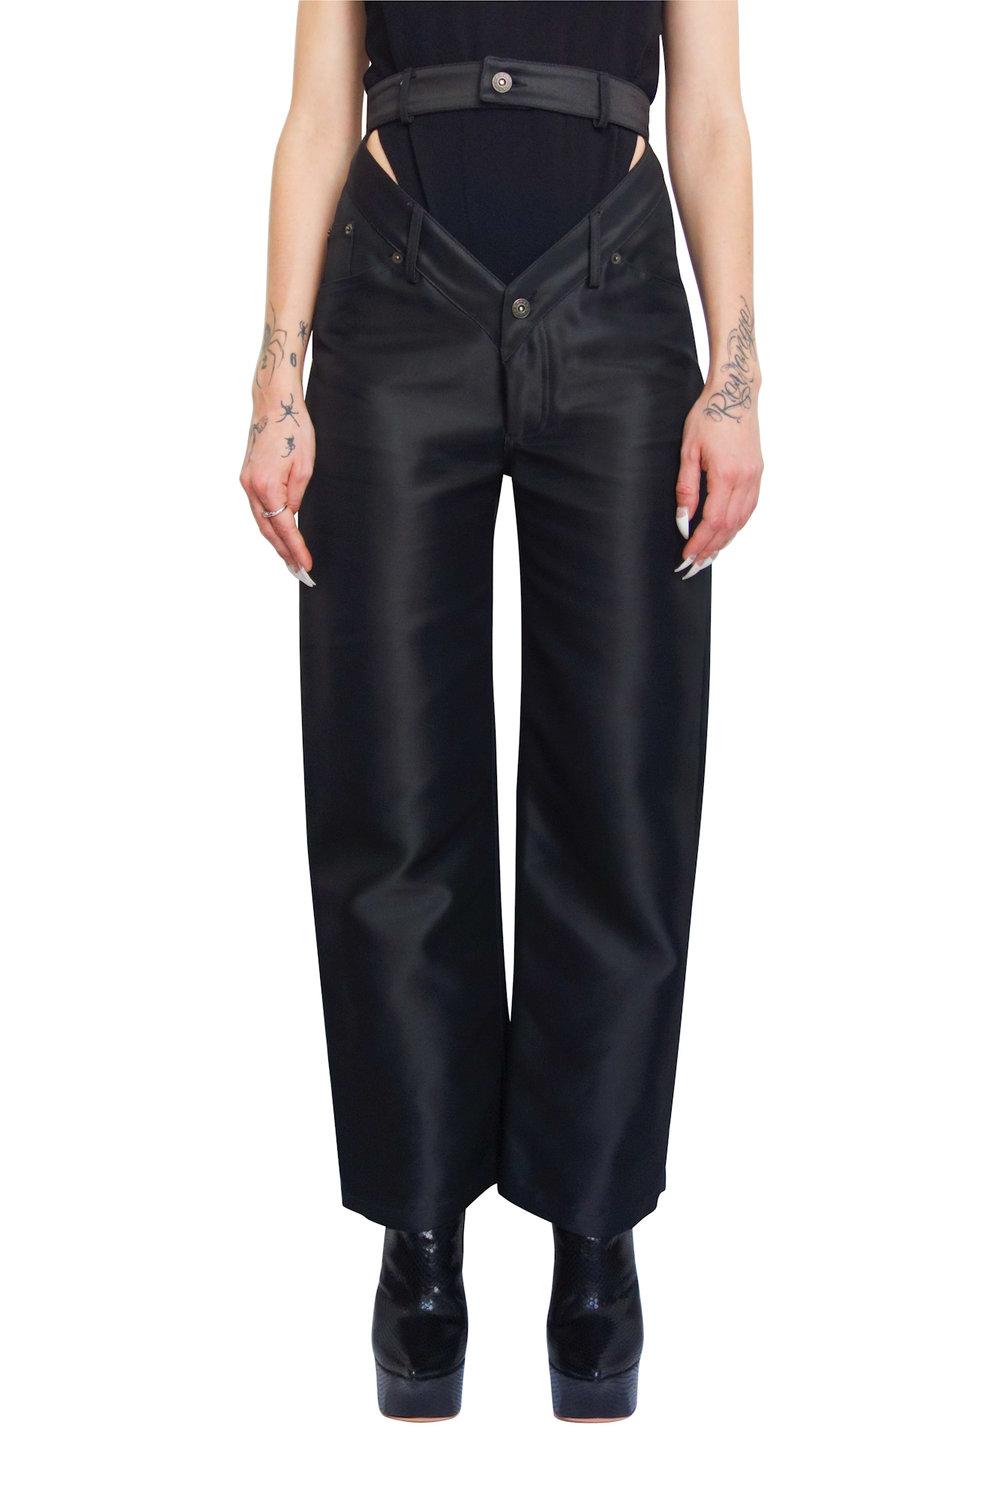 Y/PROJECT Cut Out Pants $929 -